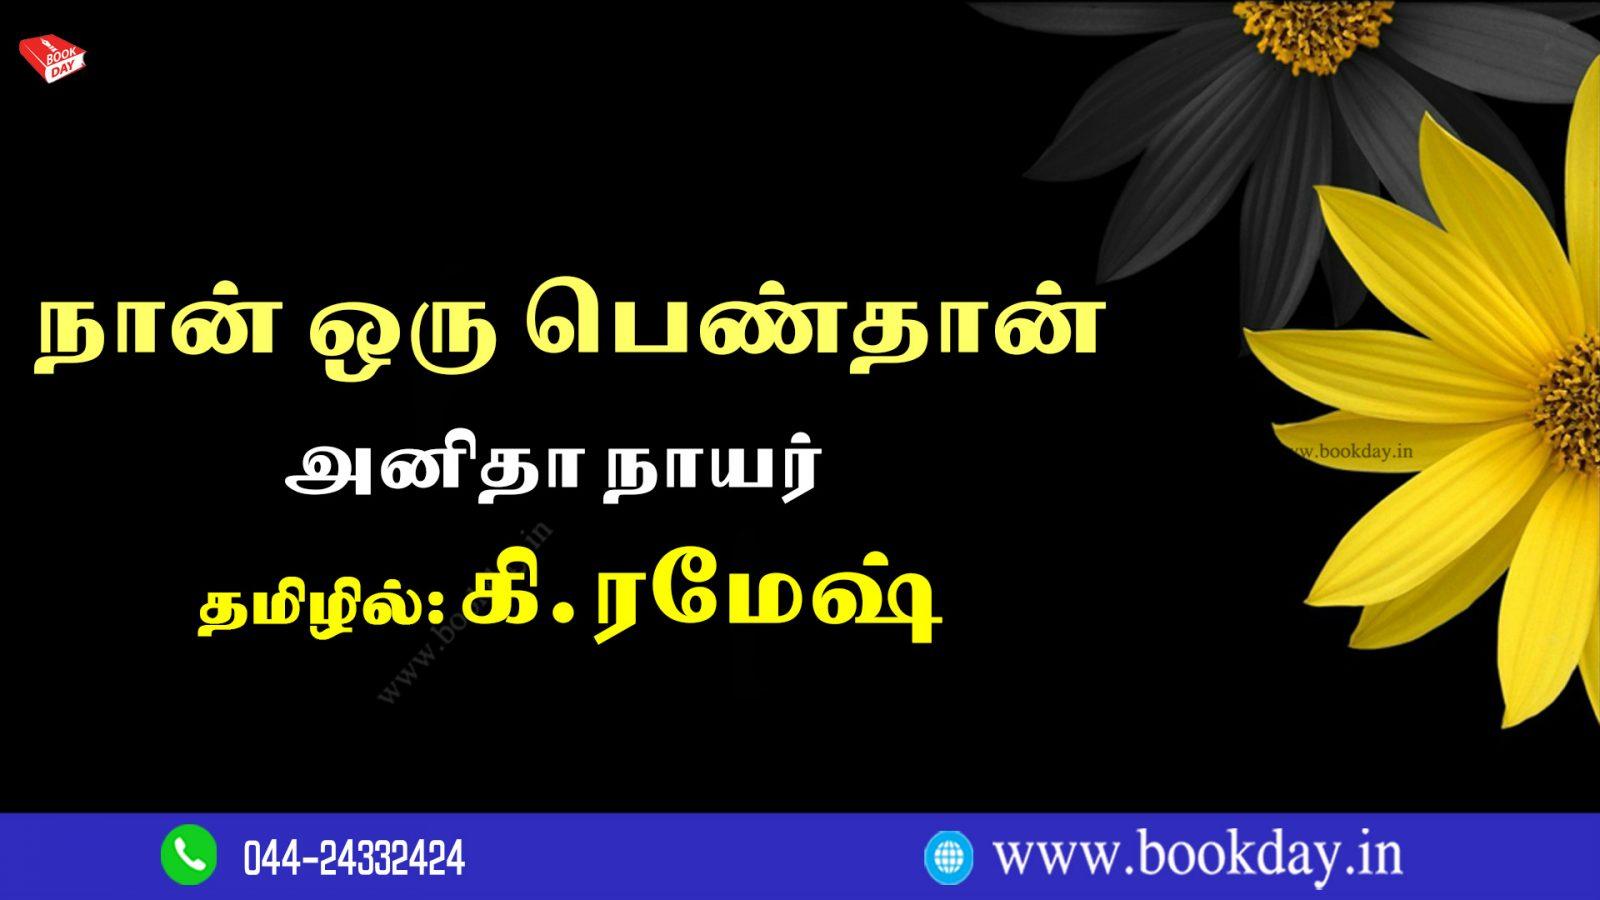 Poems Aplenty: Naan Oru Penthan Poetry by Anitha Nair. Its Translated in Tamil By K. Ramesh. நான் ஒரு பெண்தான் - அனிதா நாயர்   தமிழில்: கி. ரமேஷ்